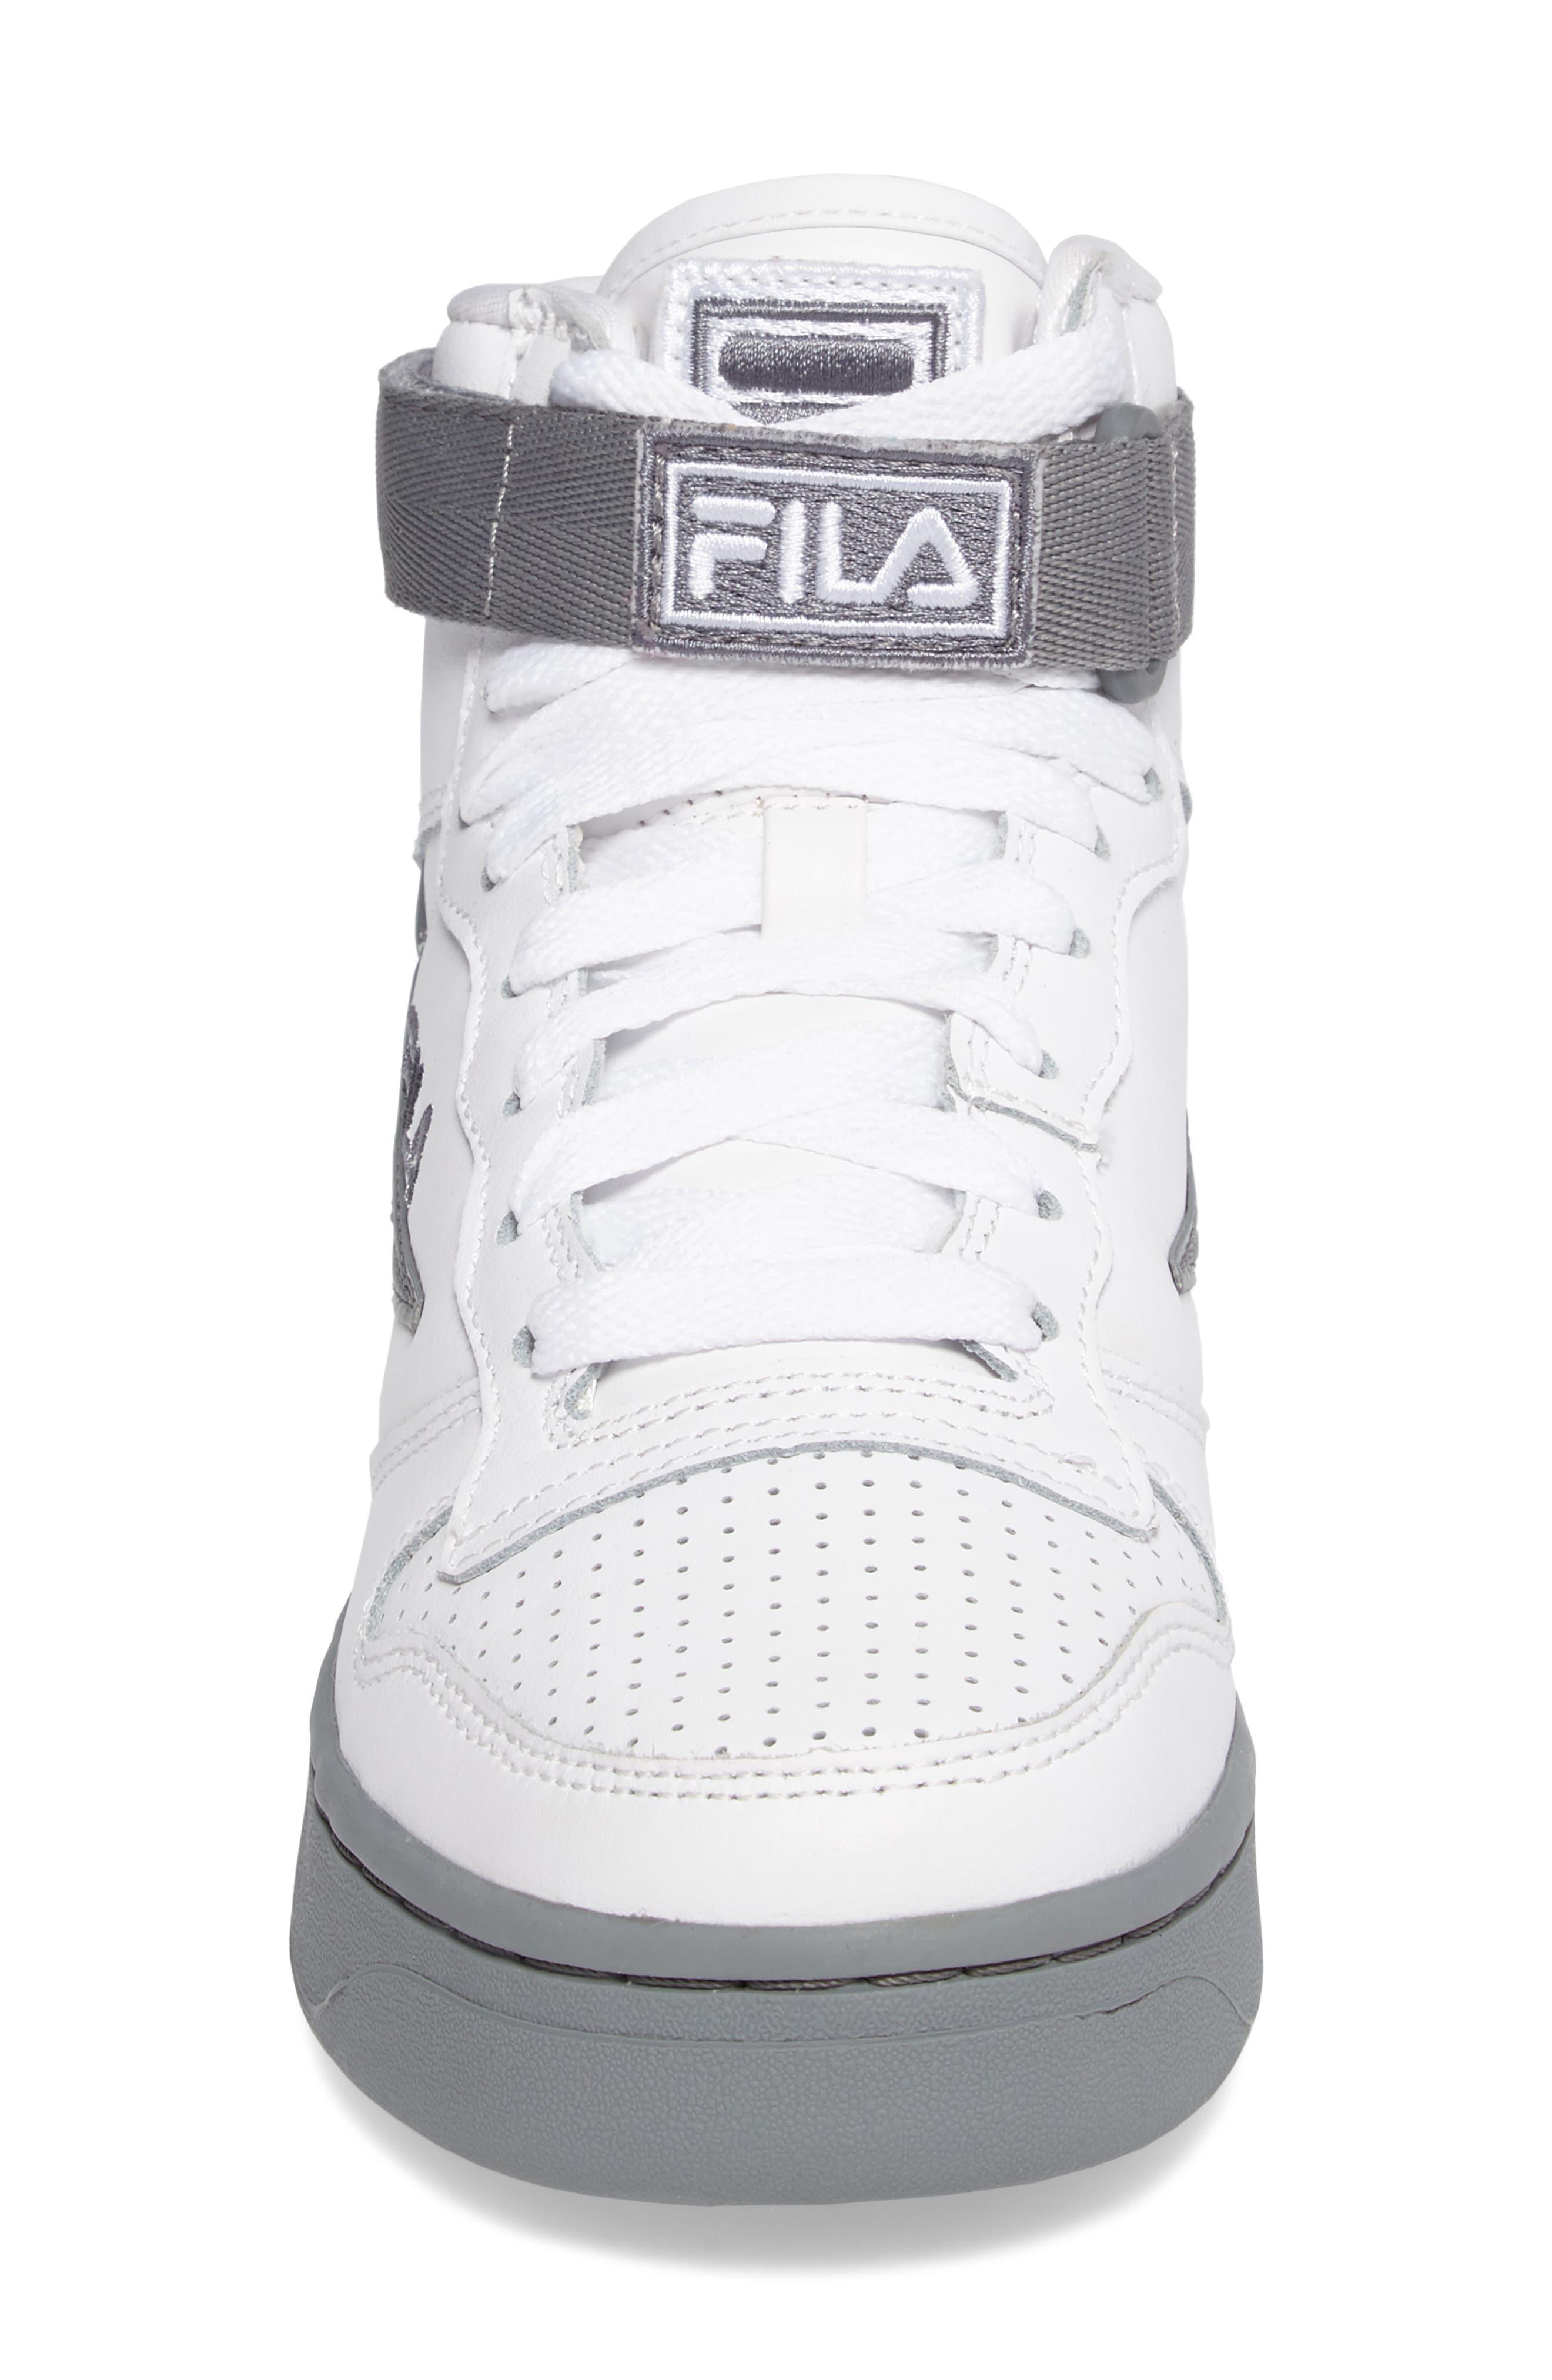 Alternate Image 4  - FILA FX-100 High Top Sneaker (Big Kid)